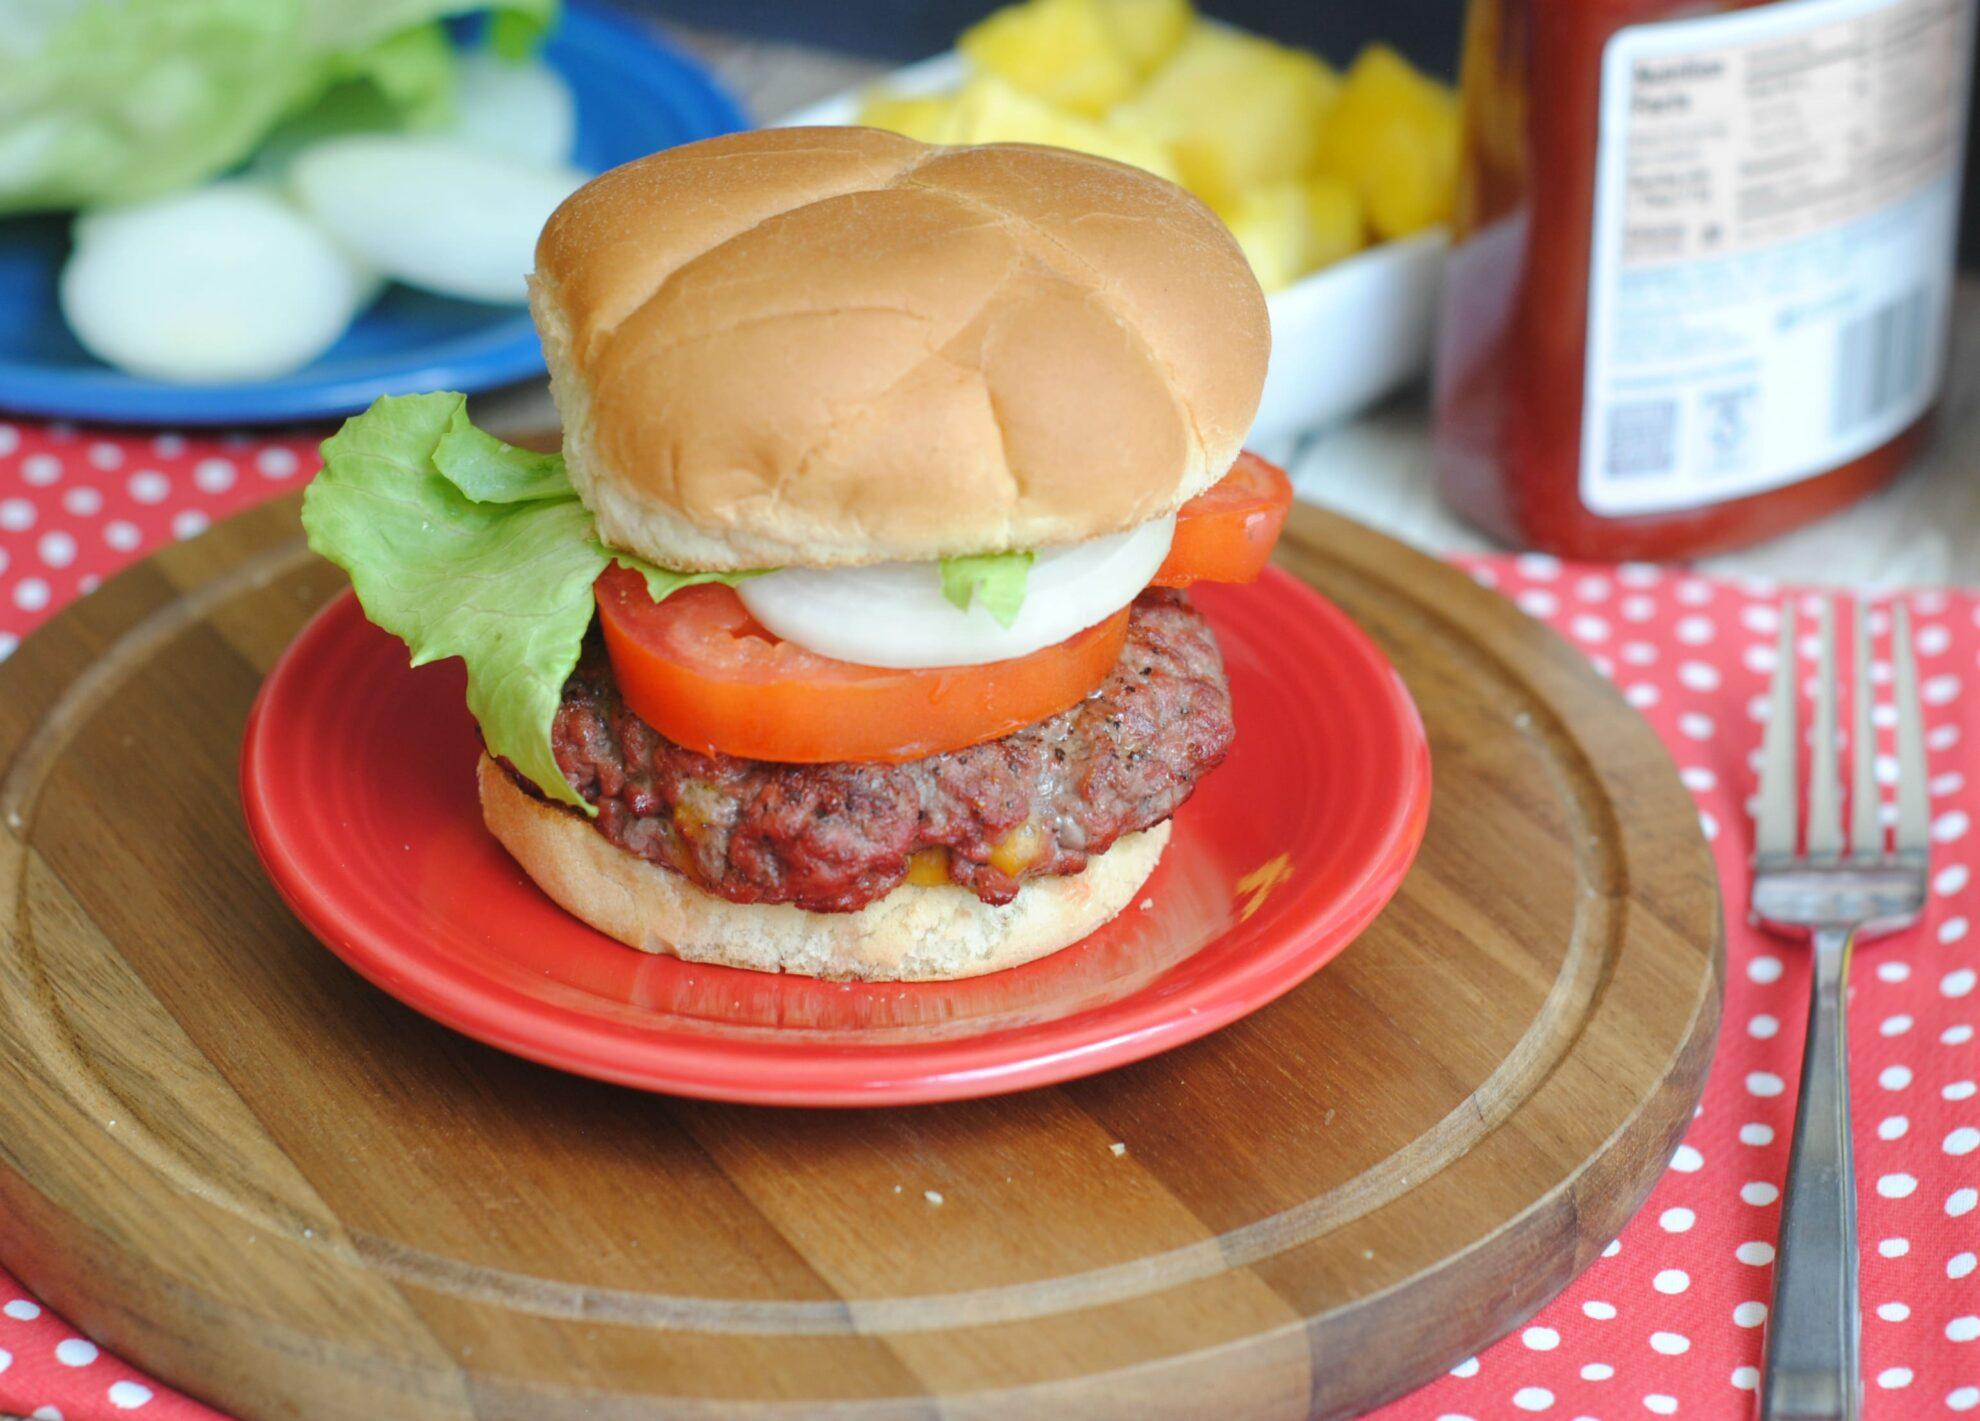 stuffed double cheeseburger